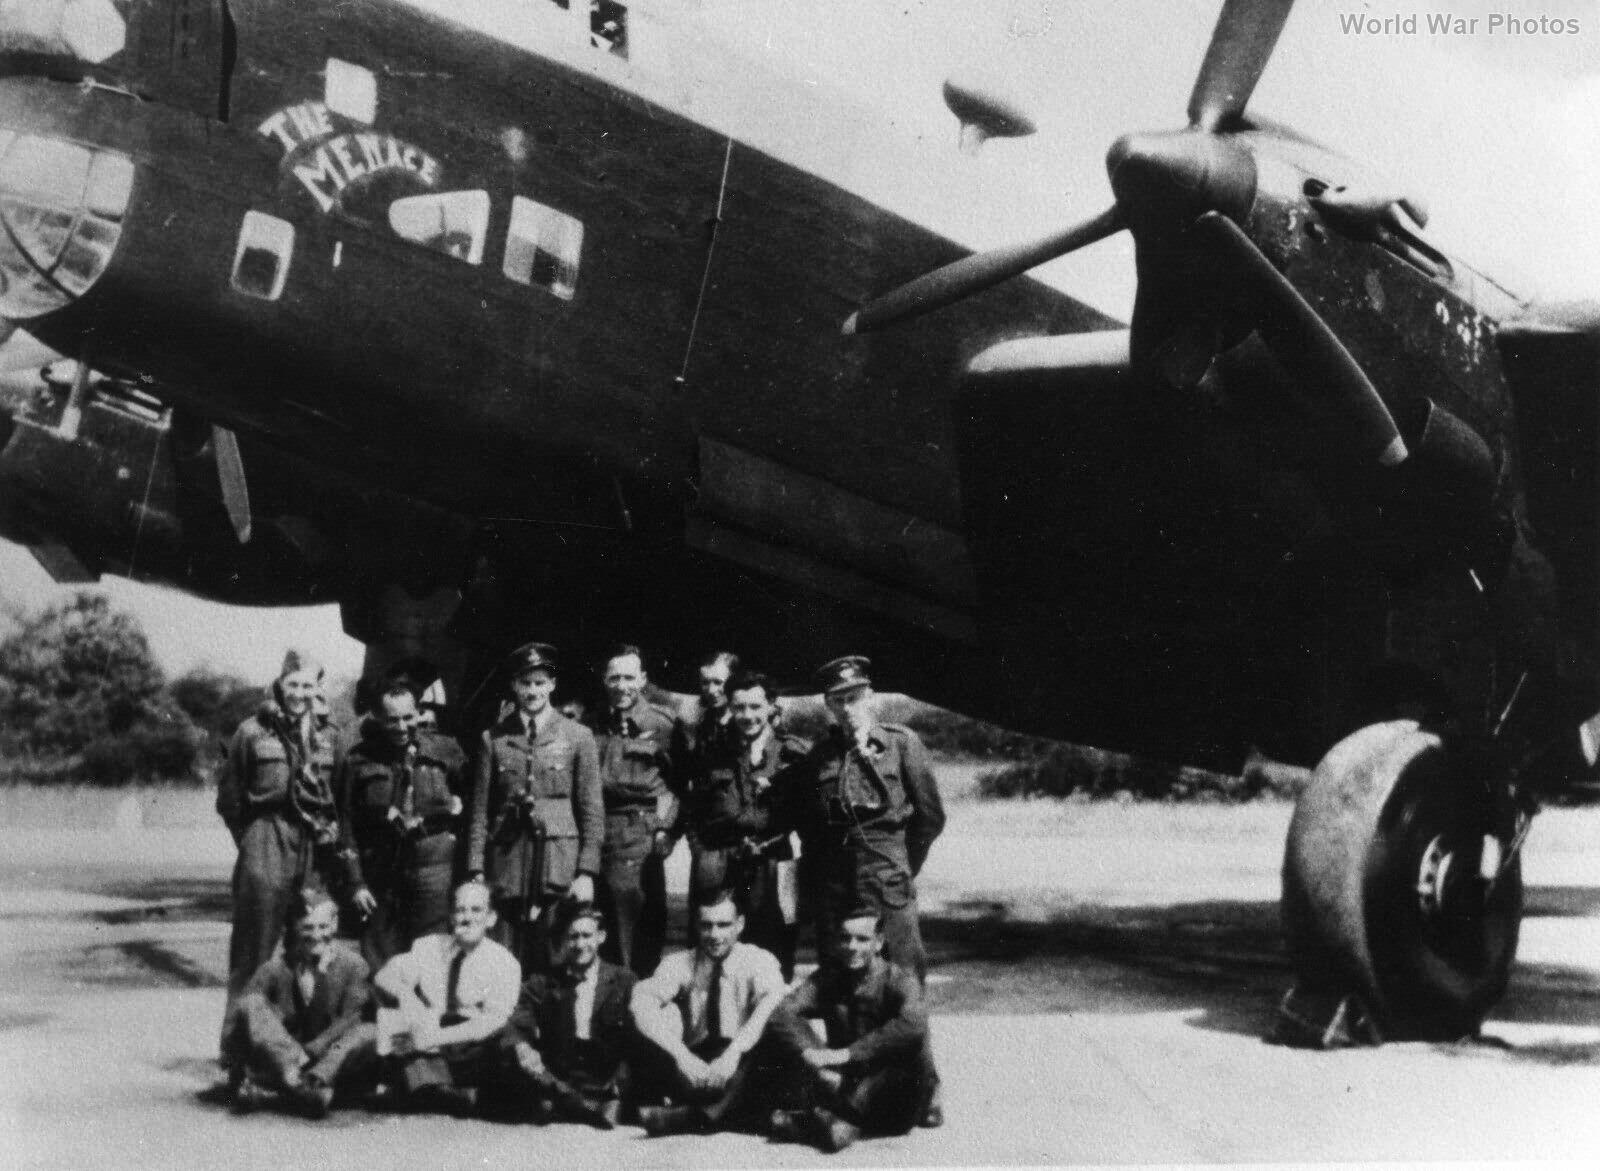 Handley Page Halifax W1108 NP-E